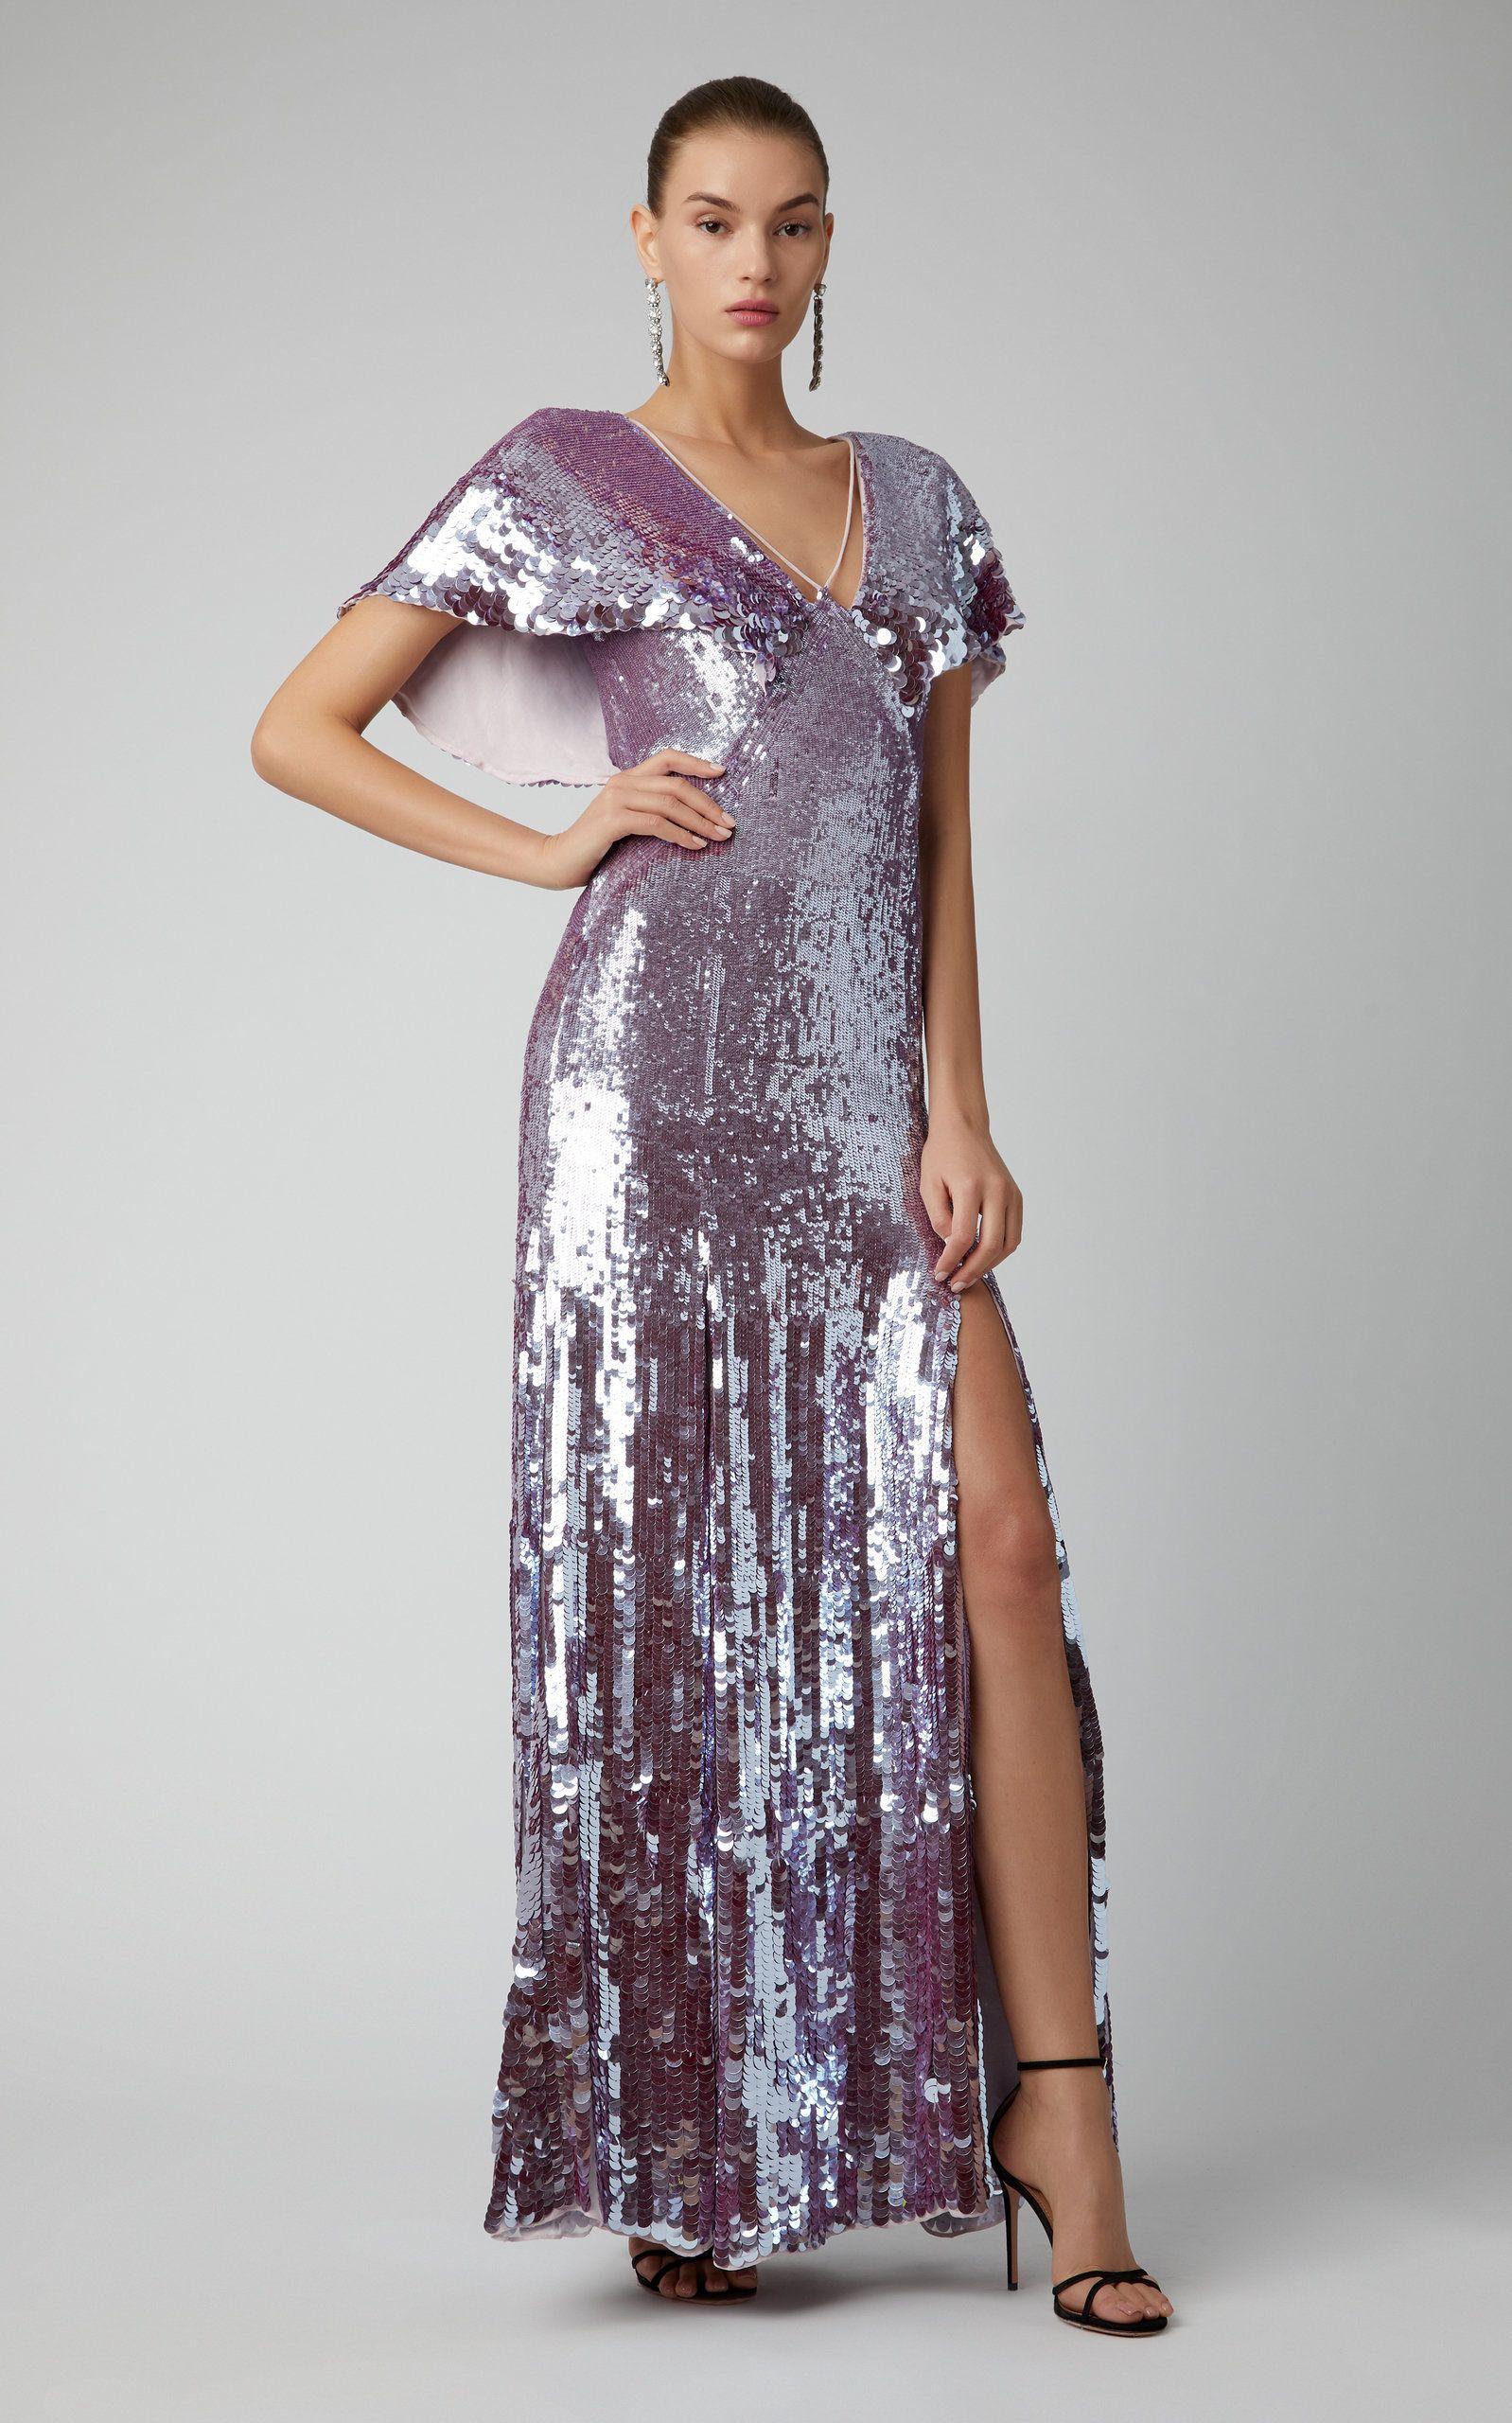 4d80ba200b7c Temperley London Exclusive Bardot Sequin Maxi Dress in 2019 ...